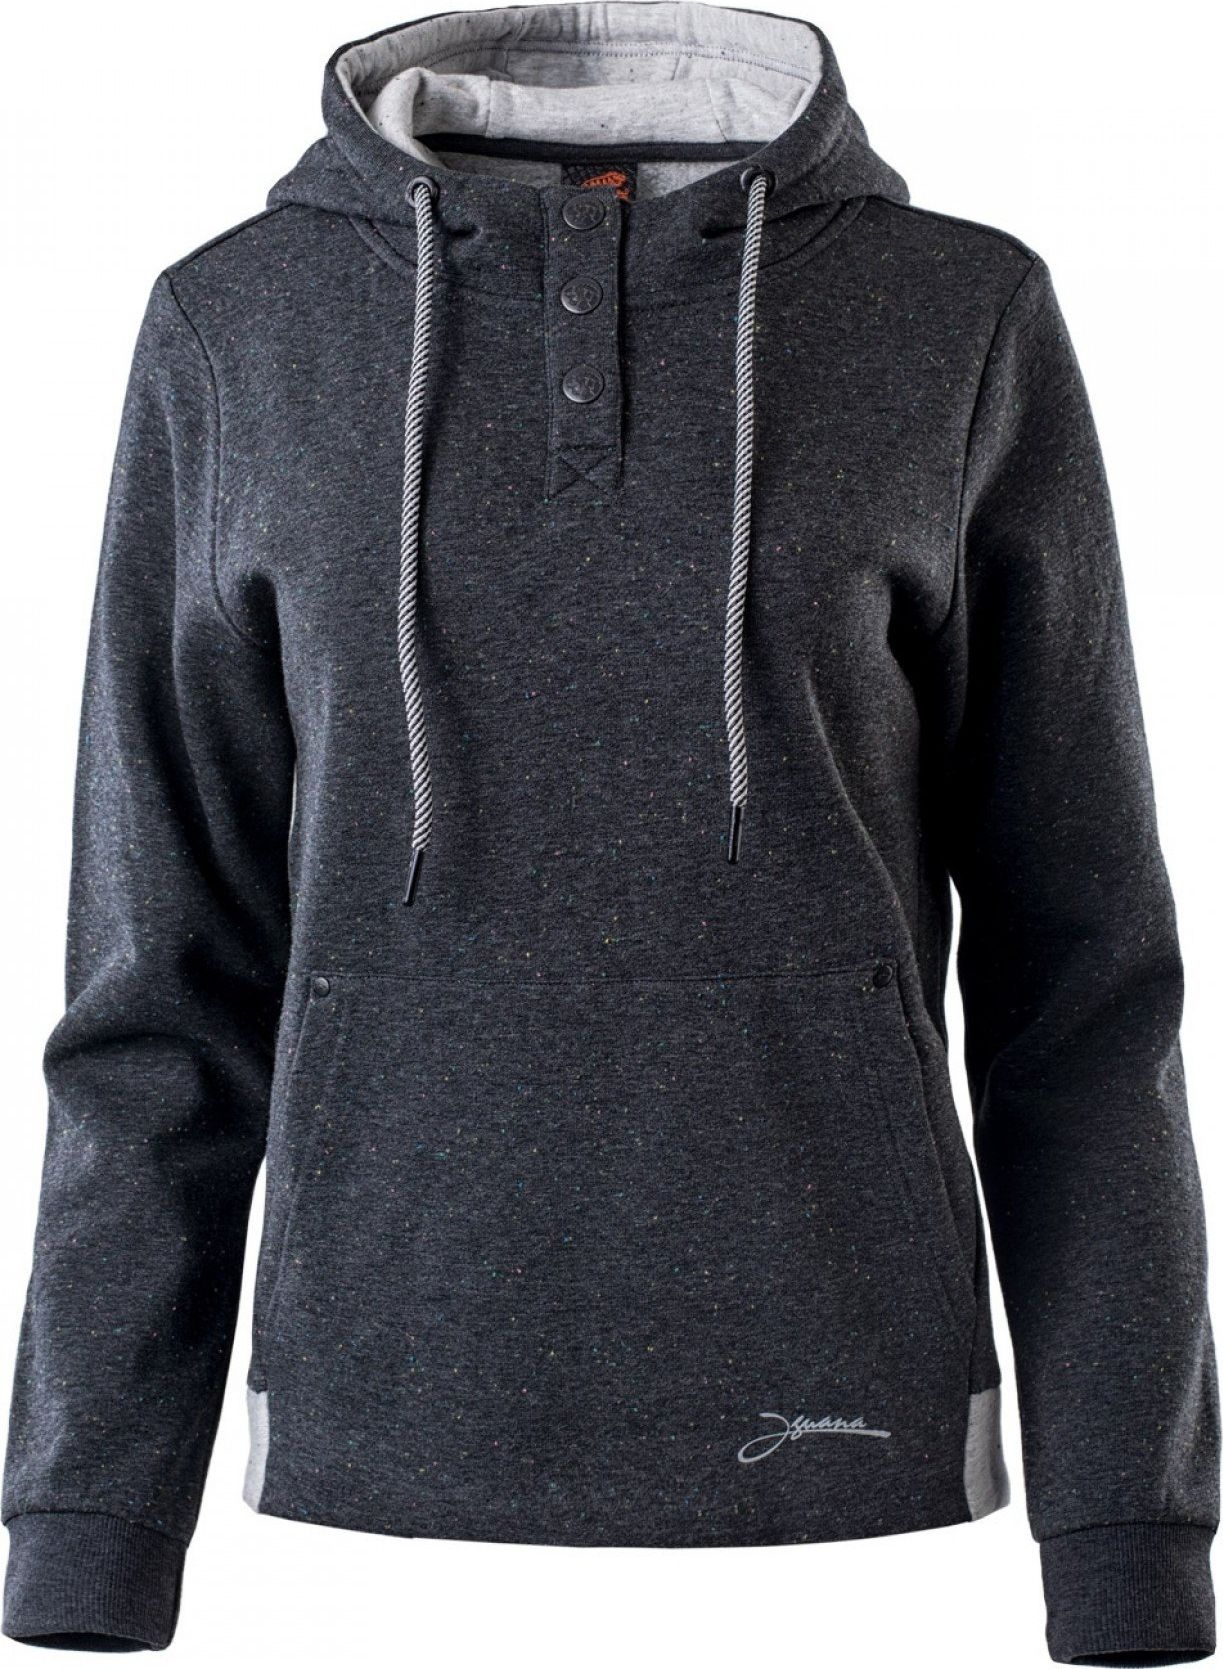 Iguana Women's Sweatshirt Cassia W dark gray melange s